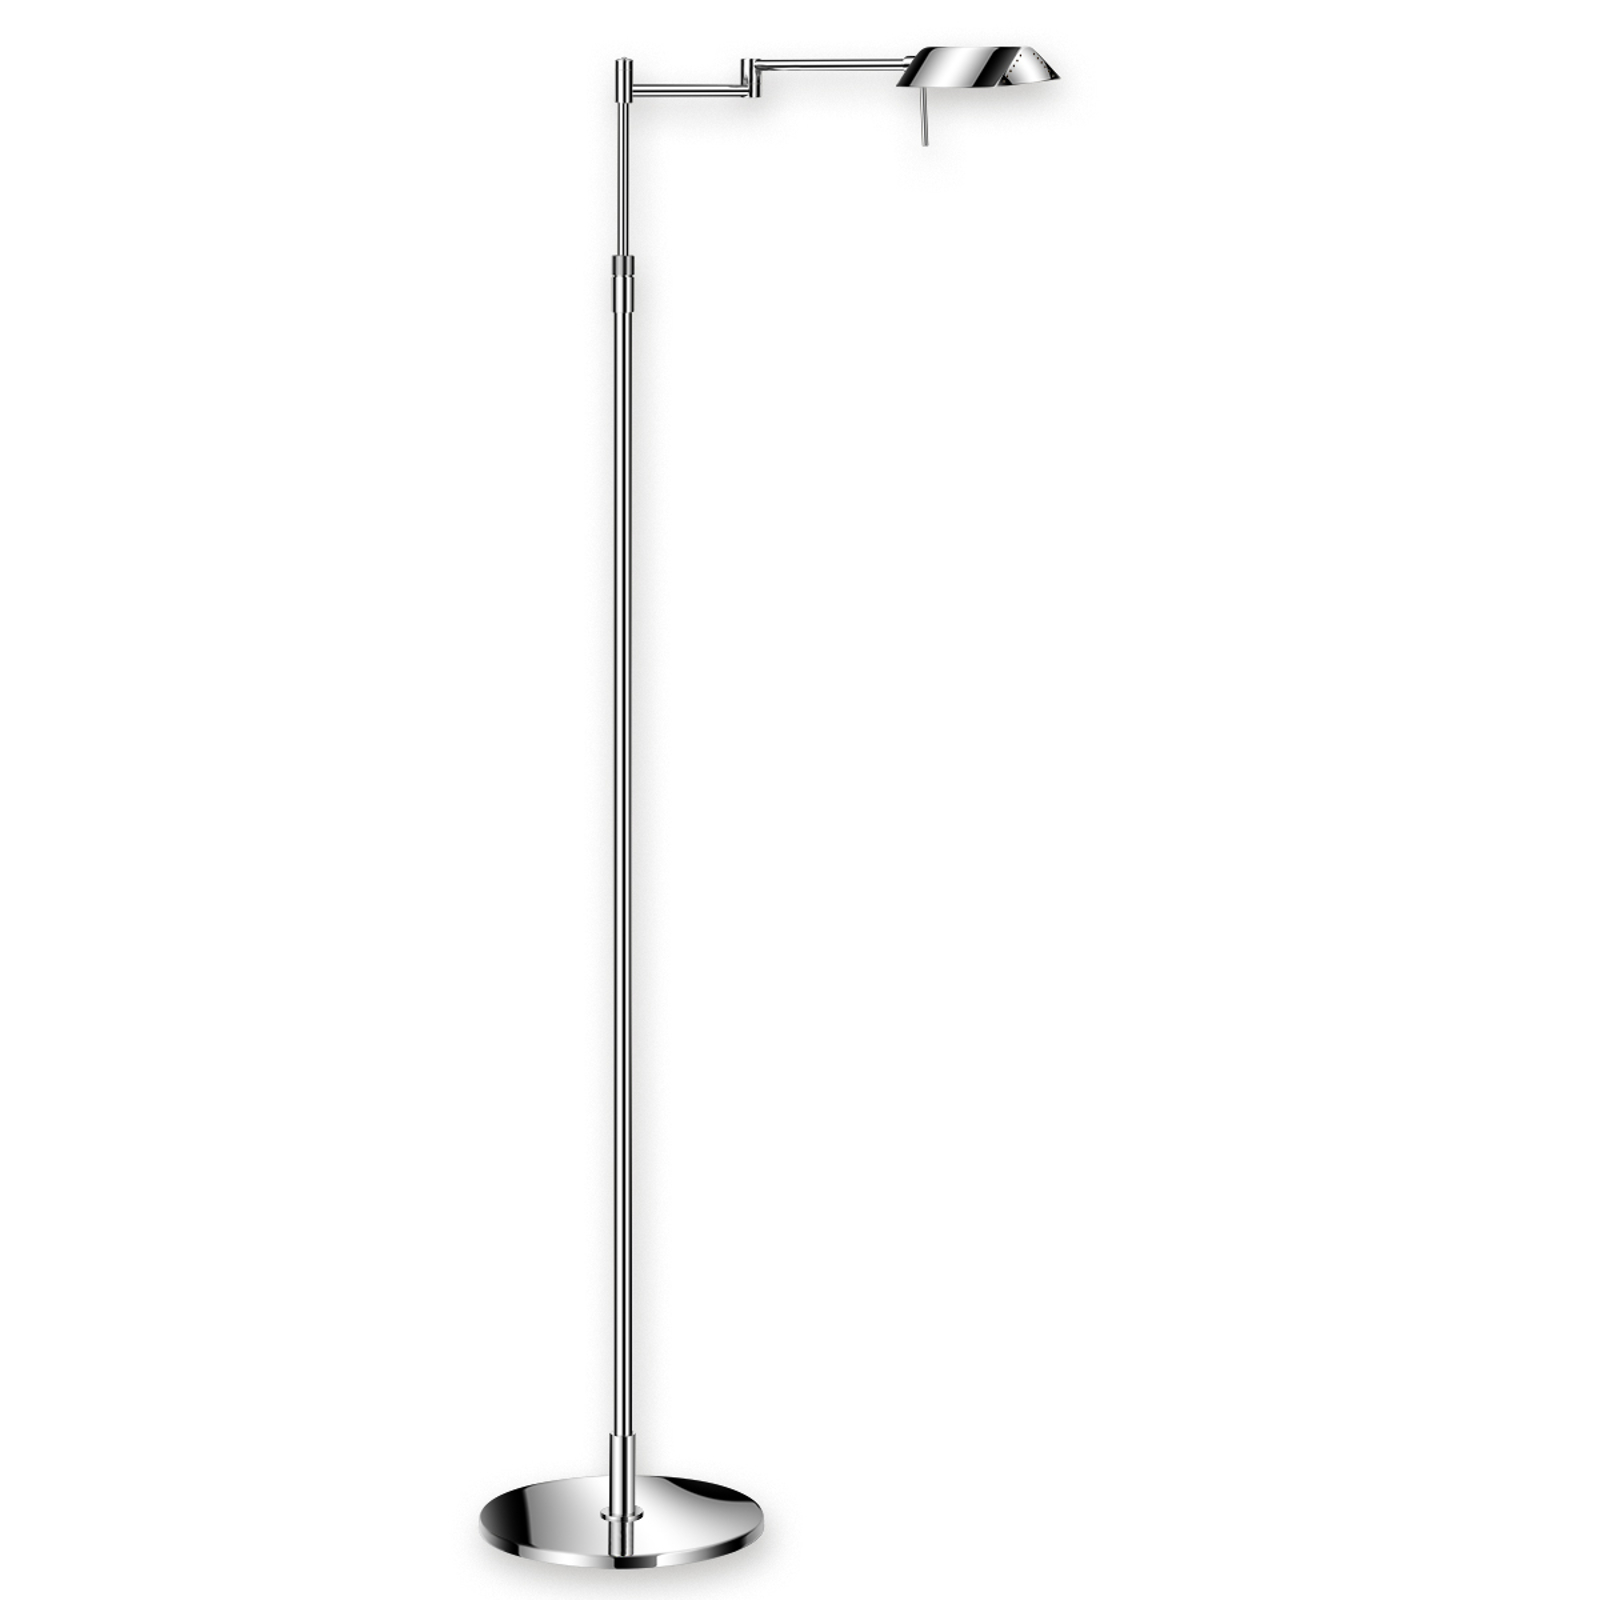 Lampadaire LED FINN raffiné chromé